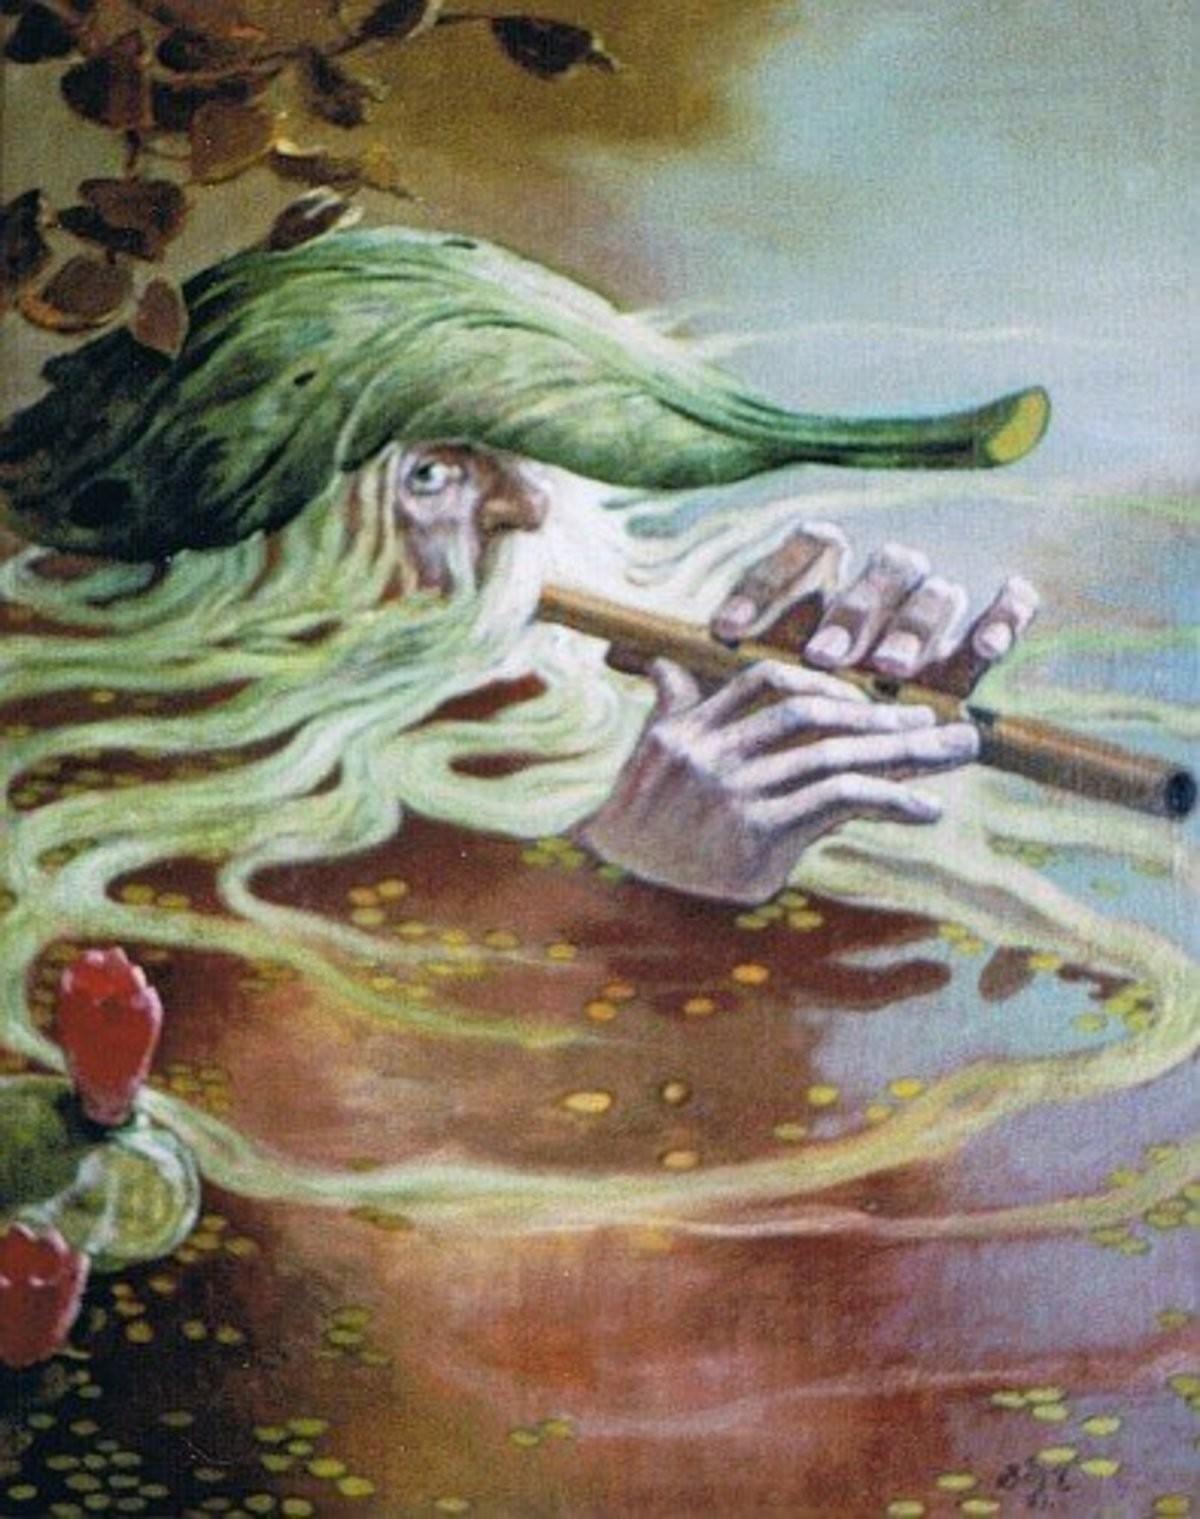 Slavic Bestiary - Vodyanoy the Drowner